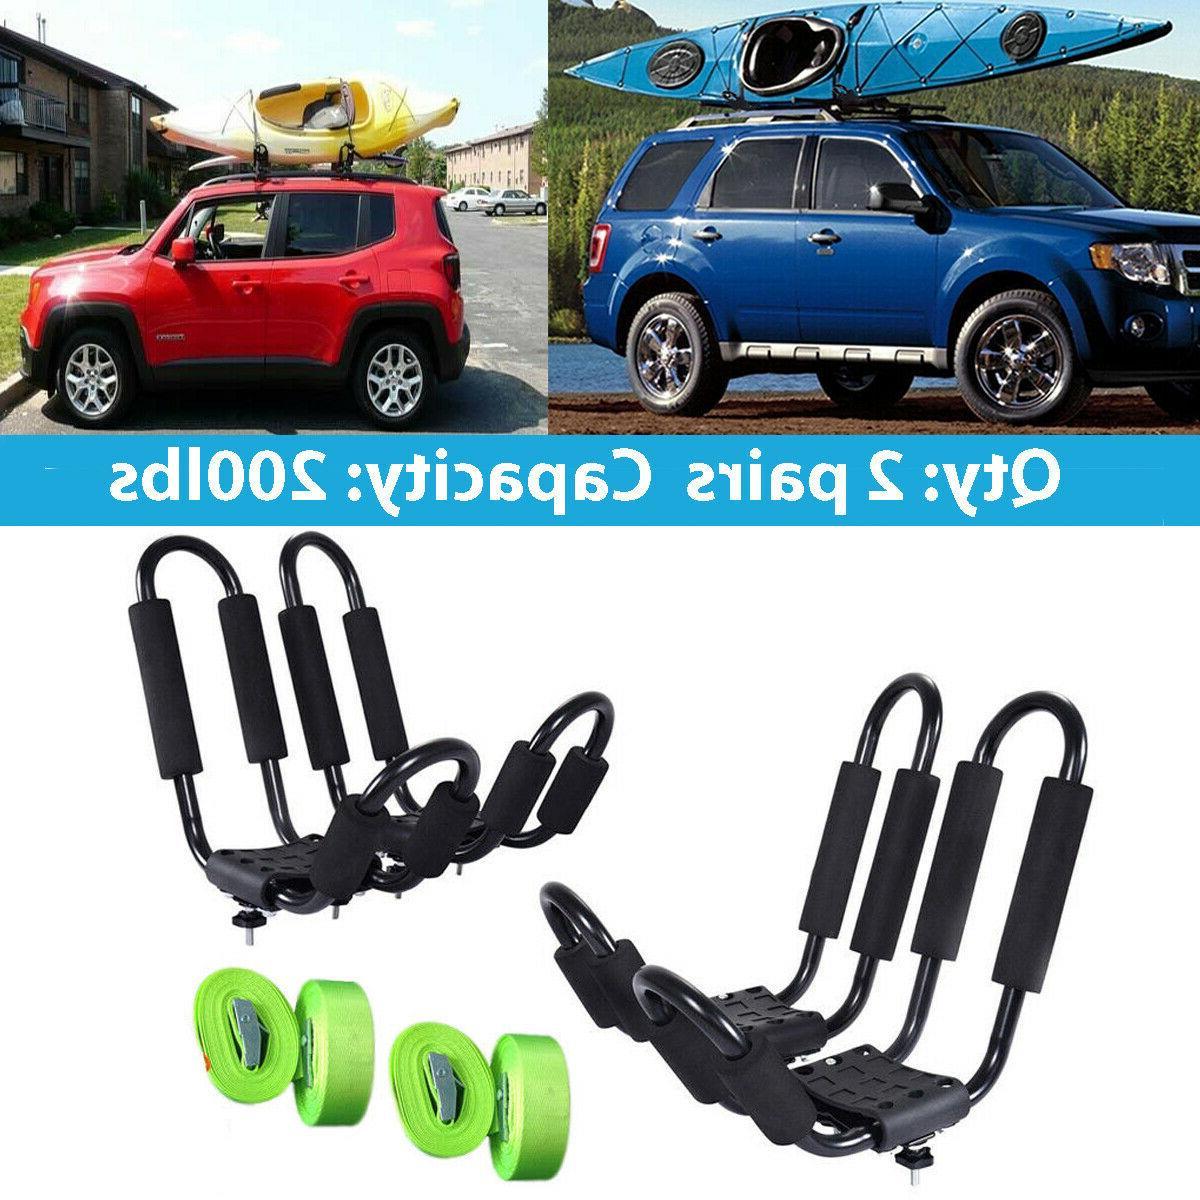 1pair folding universal kayak car roof rack